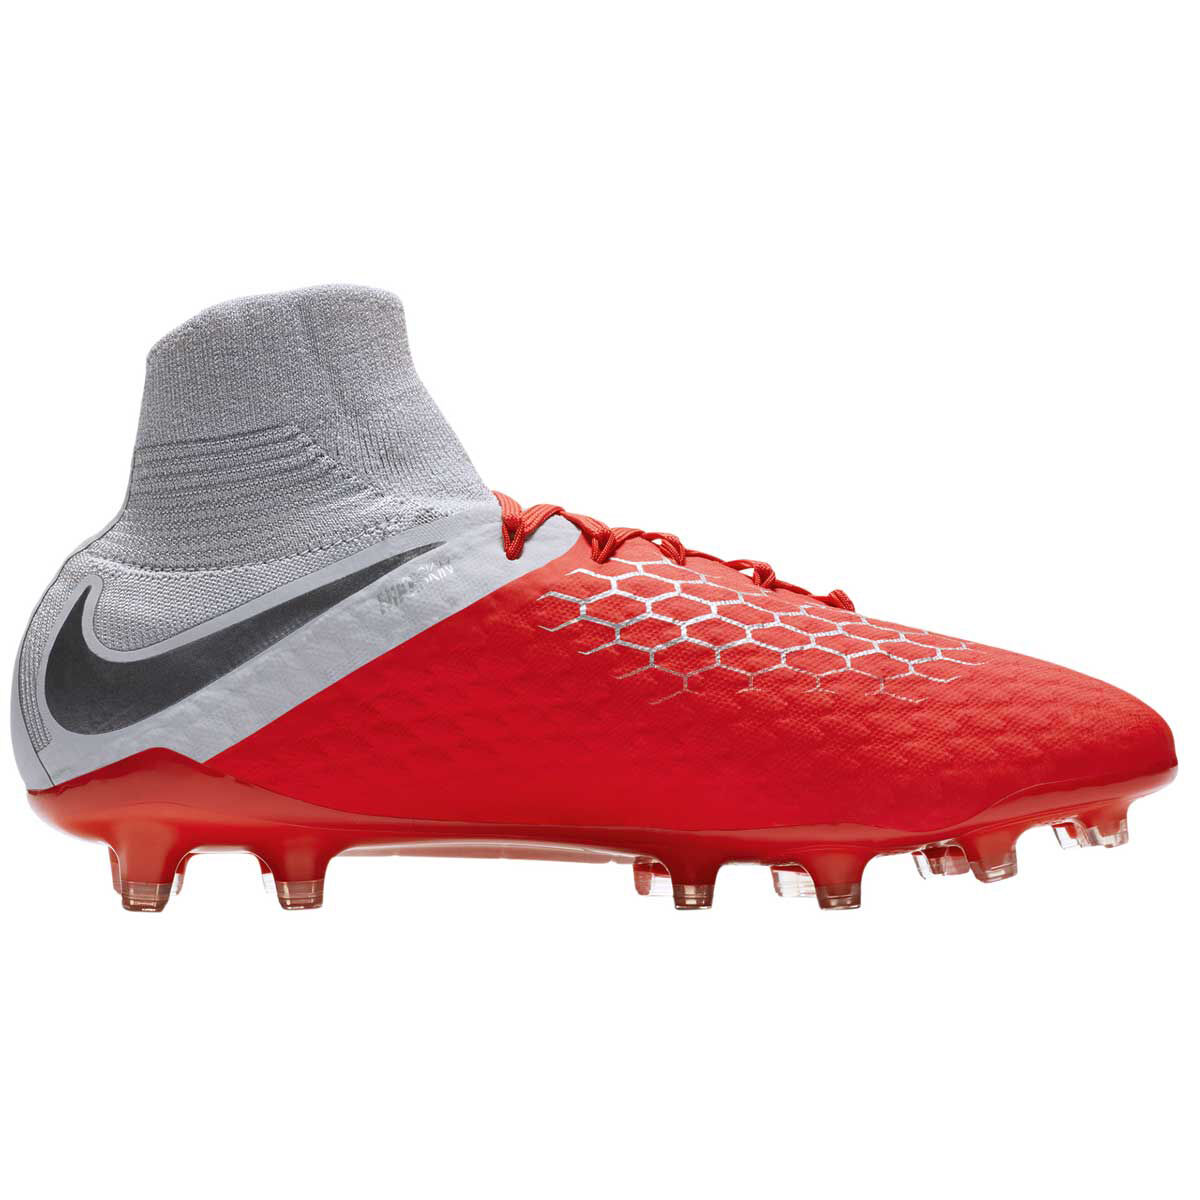 Nike Hypervenom Football Boots No Spikes, Sports, Sports